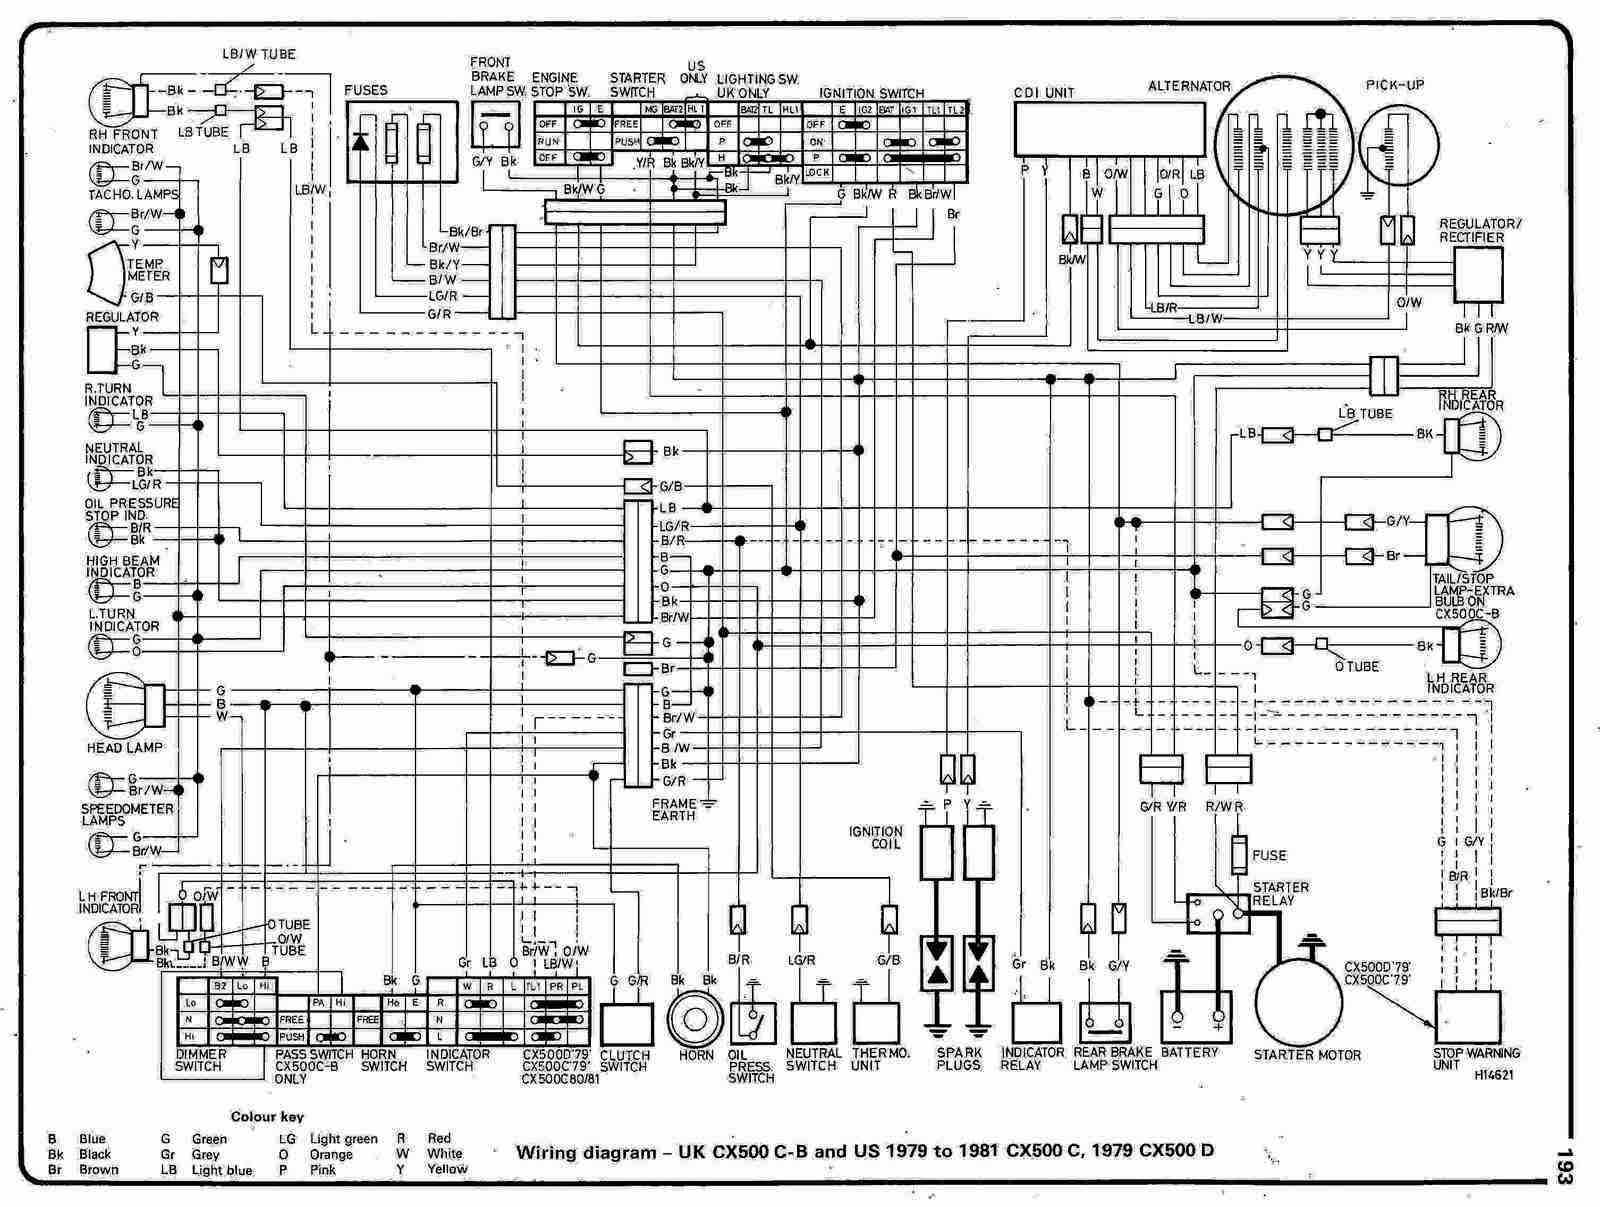 Honda Cb Unicorn Wiring Diagram - Wiring Diagram Database